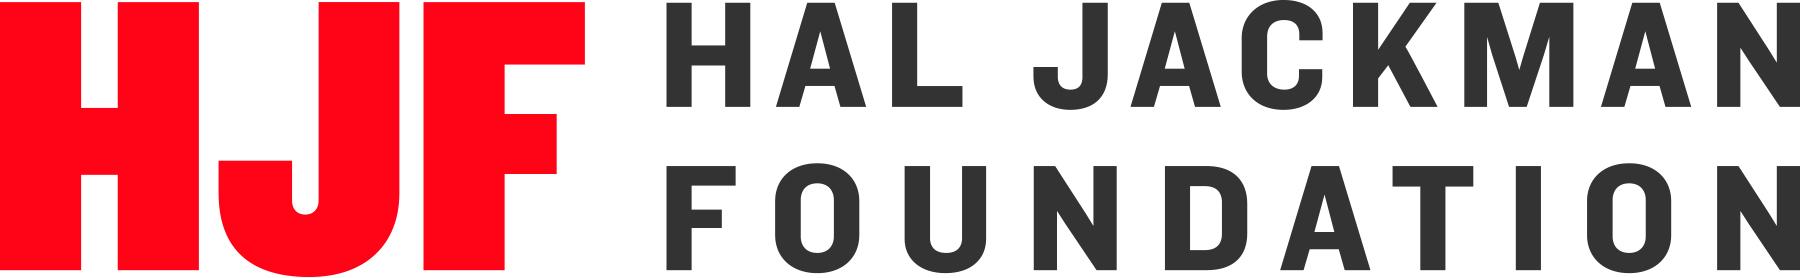 hjf-logo-horizontal-cmyk-print